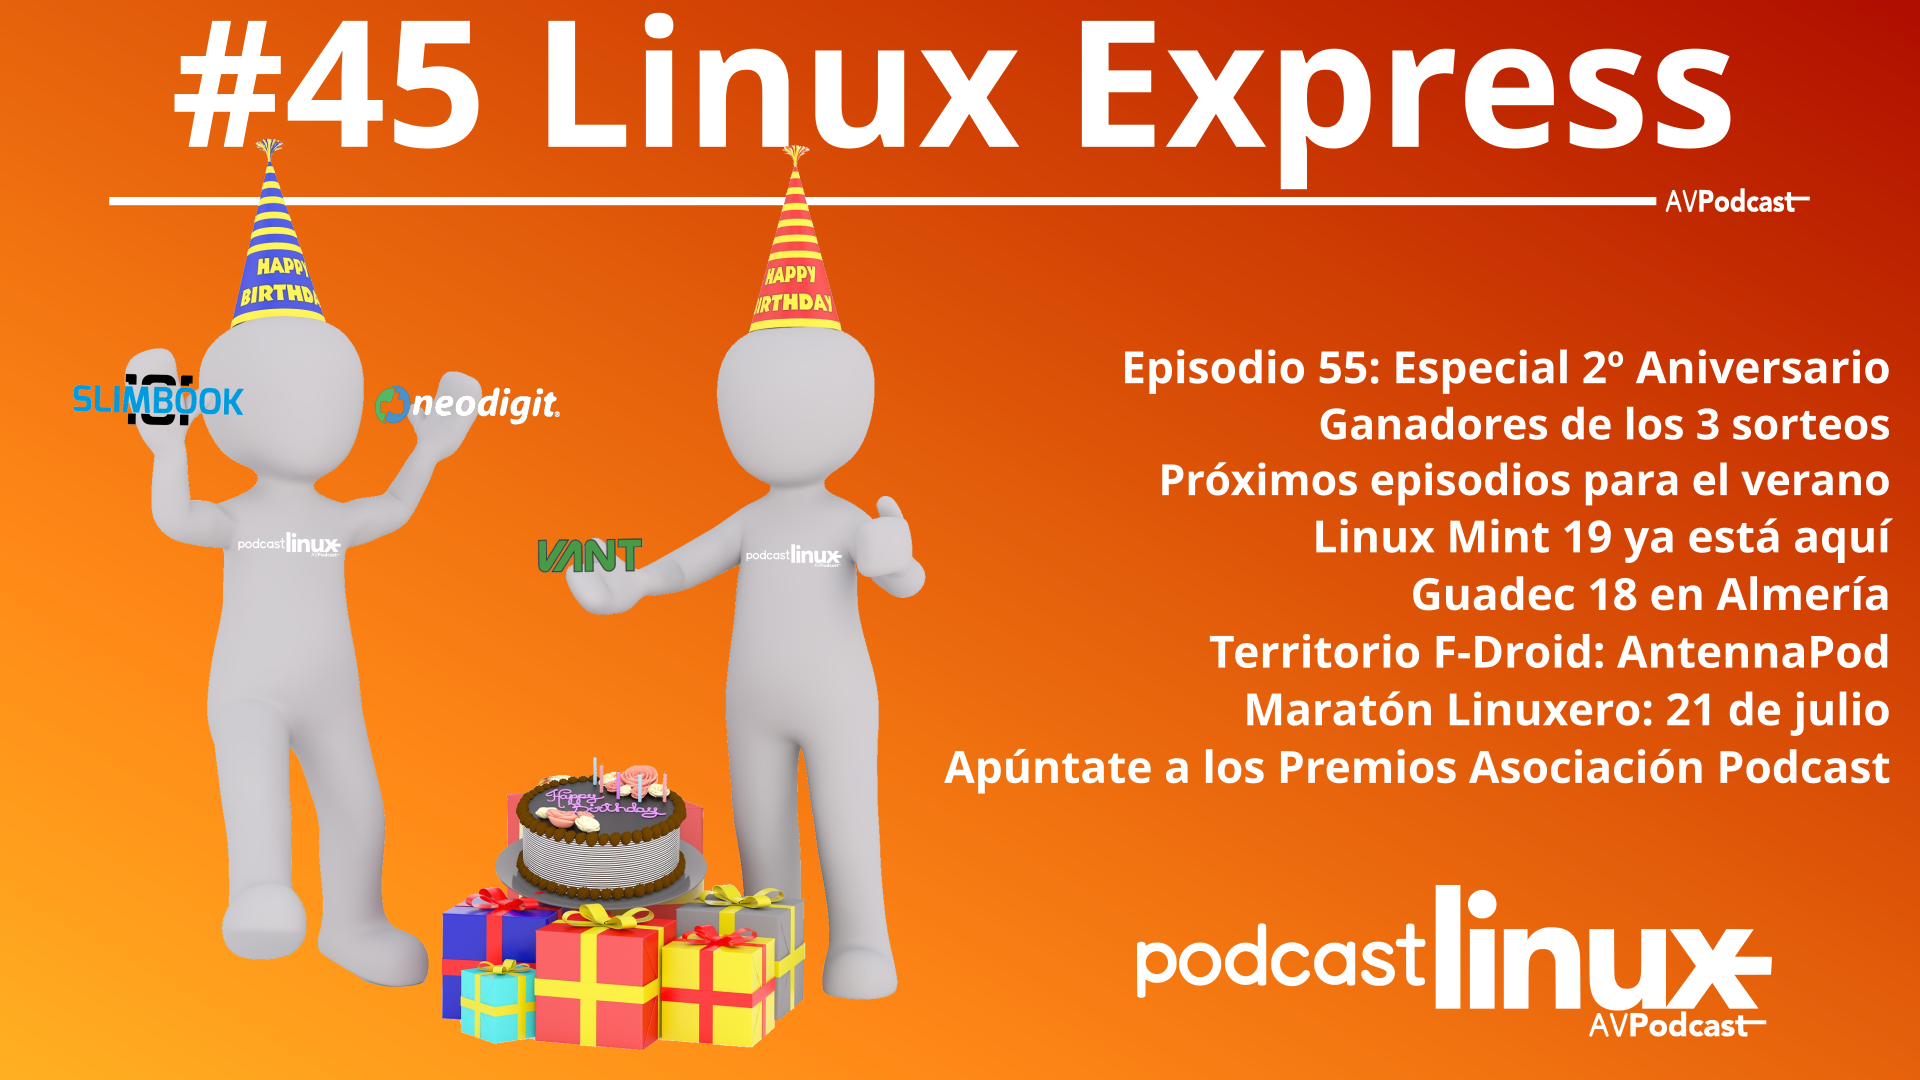 #45 Linux Express